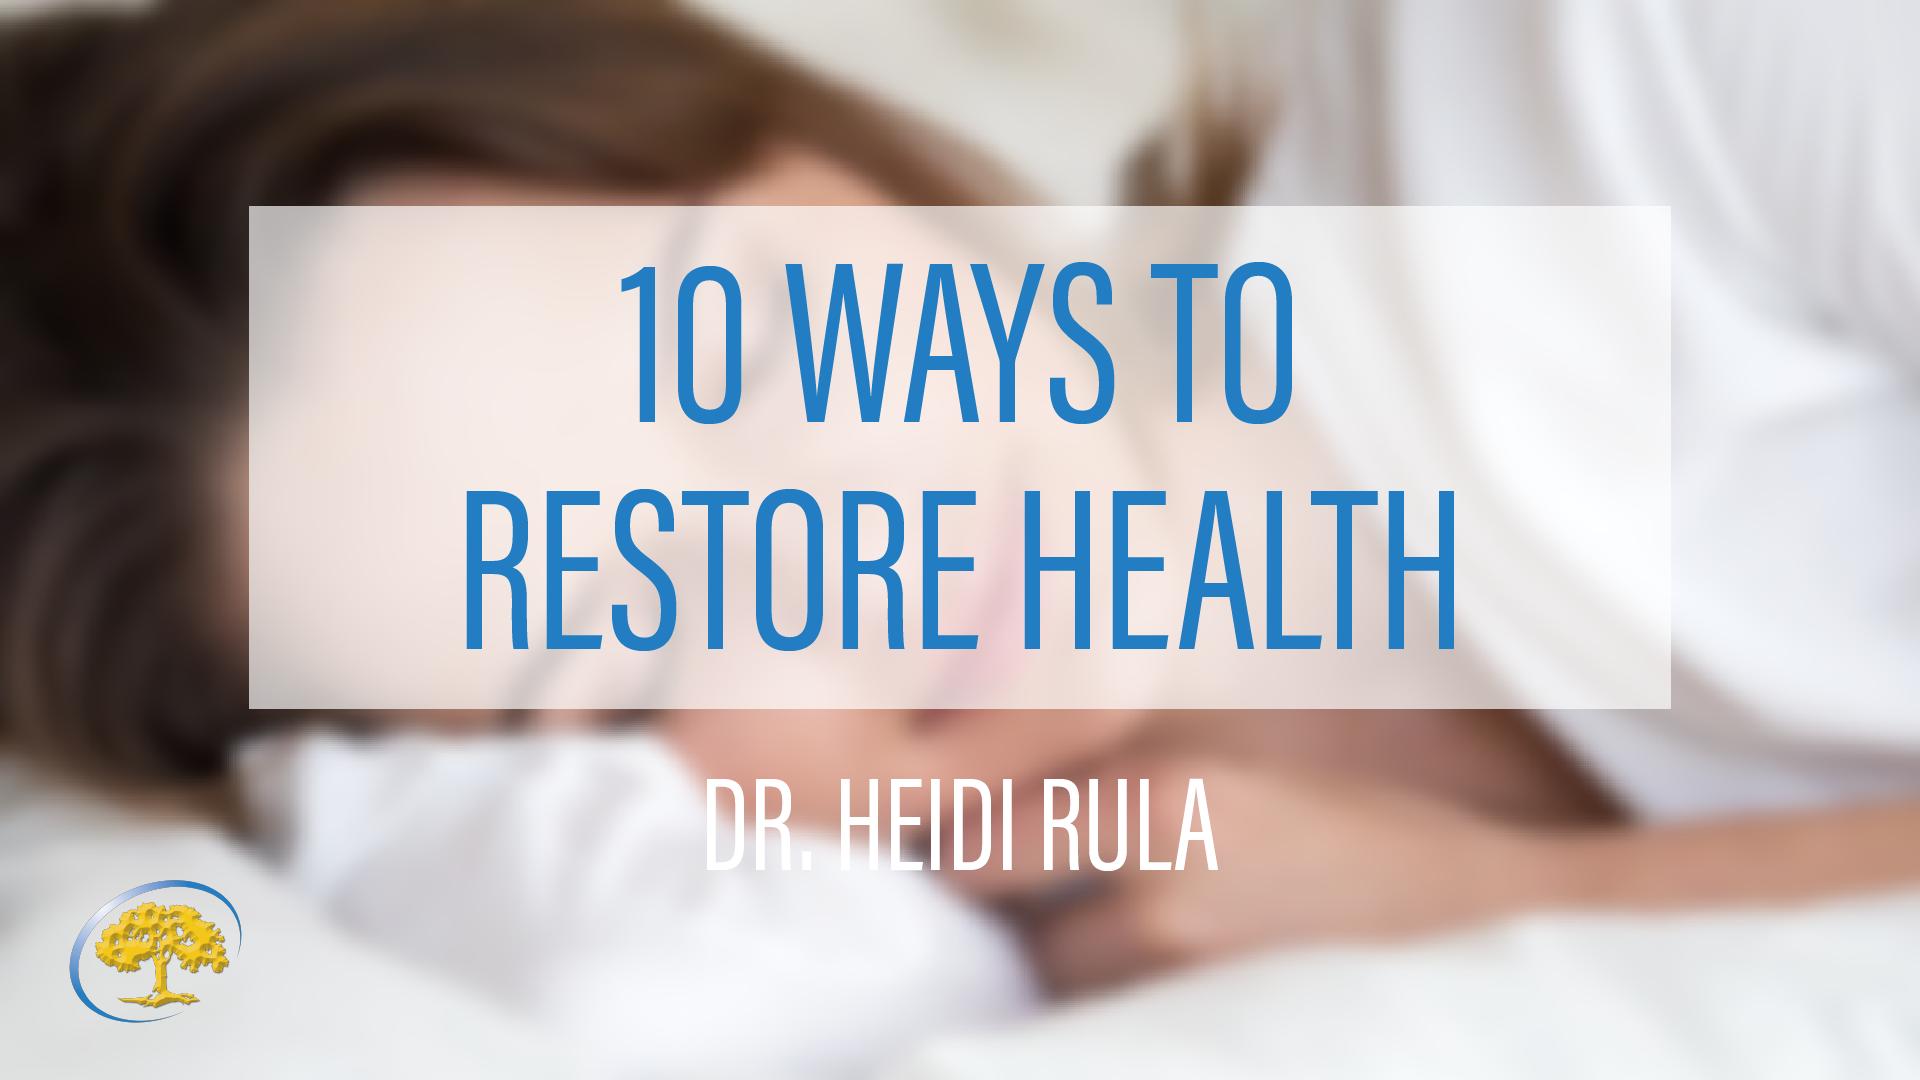 Dr. Heidi Rula 10 Ways to Restore Health